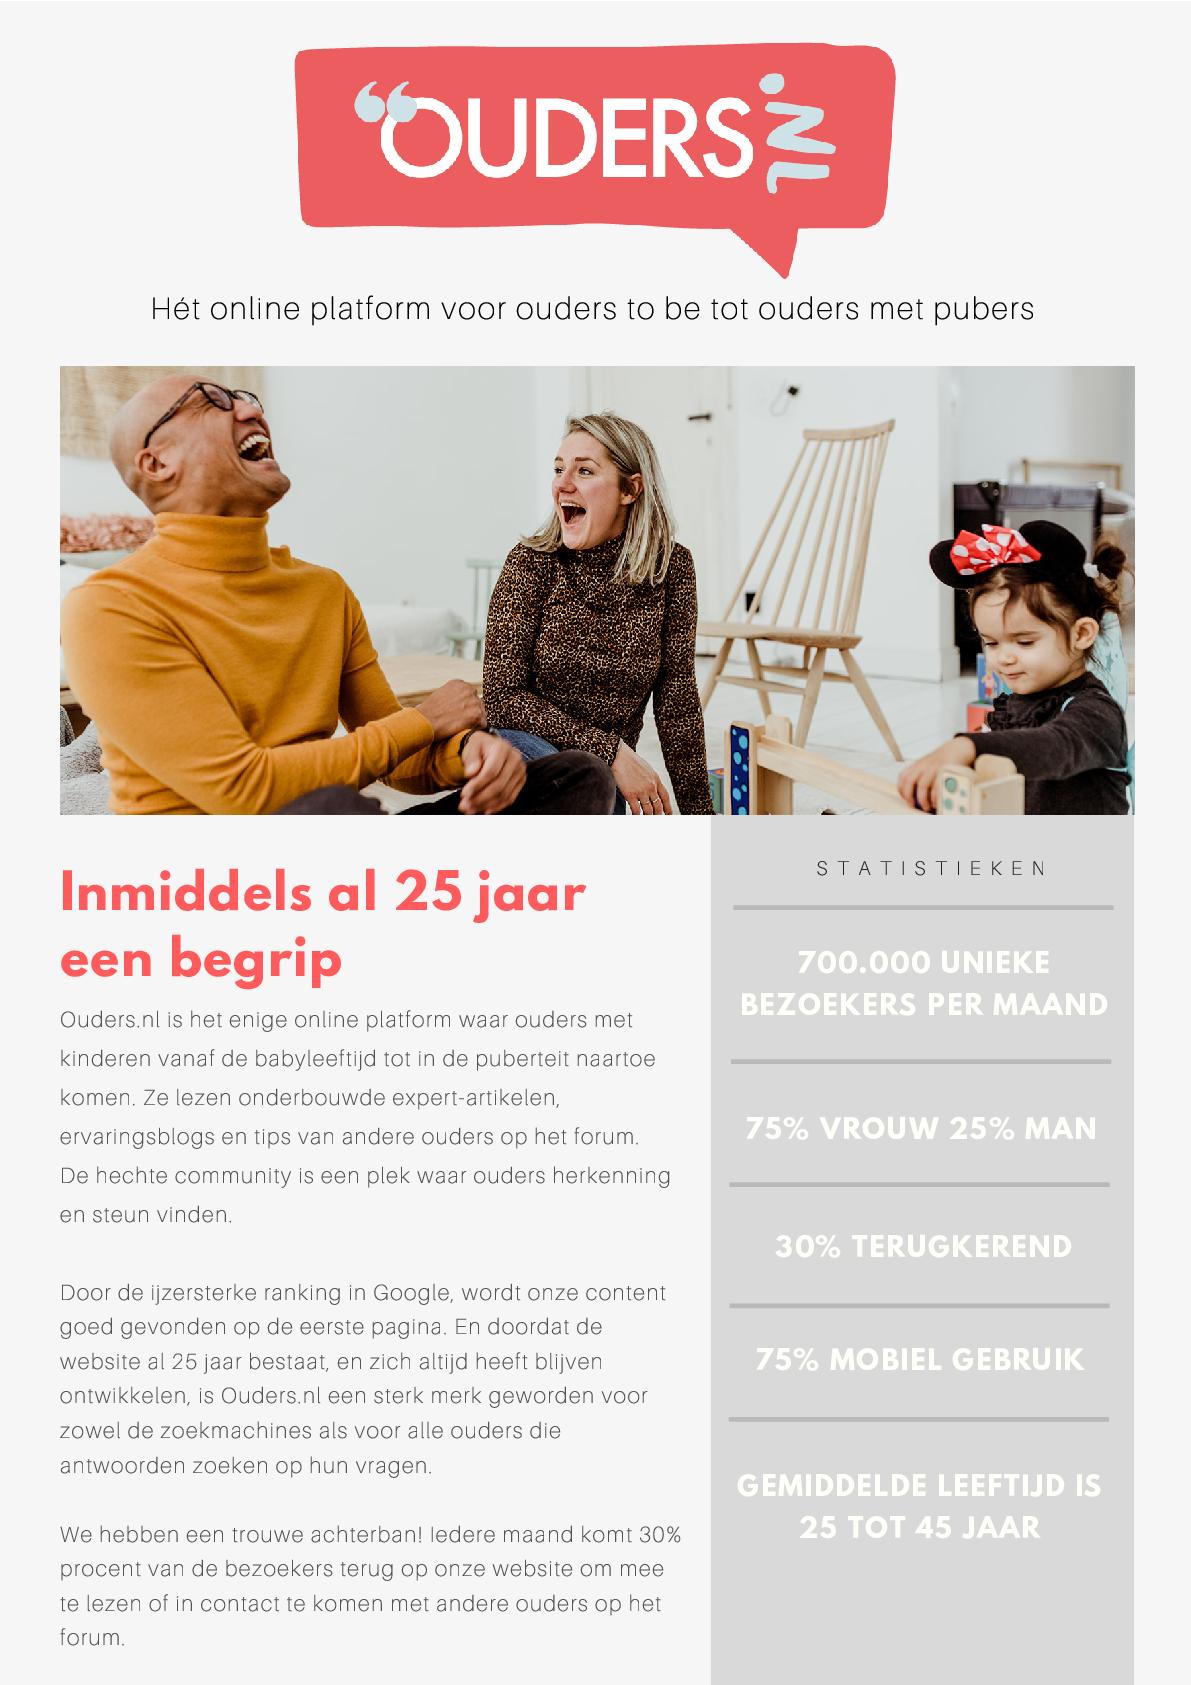 Mediakit-Ouders.nl-2021.png